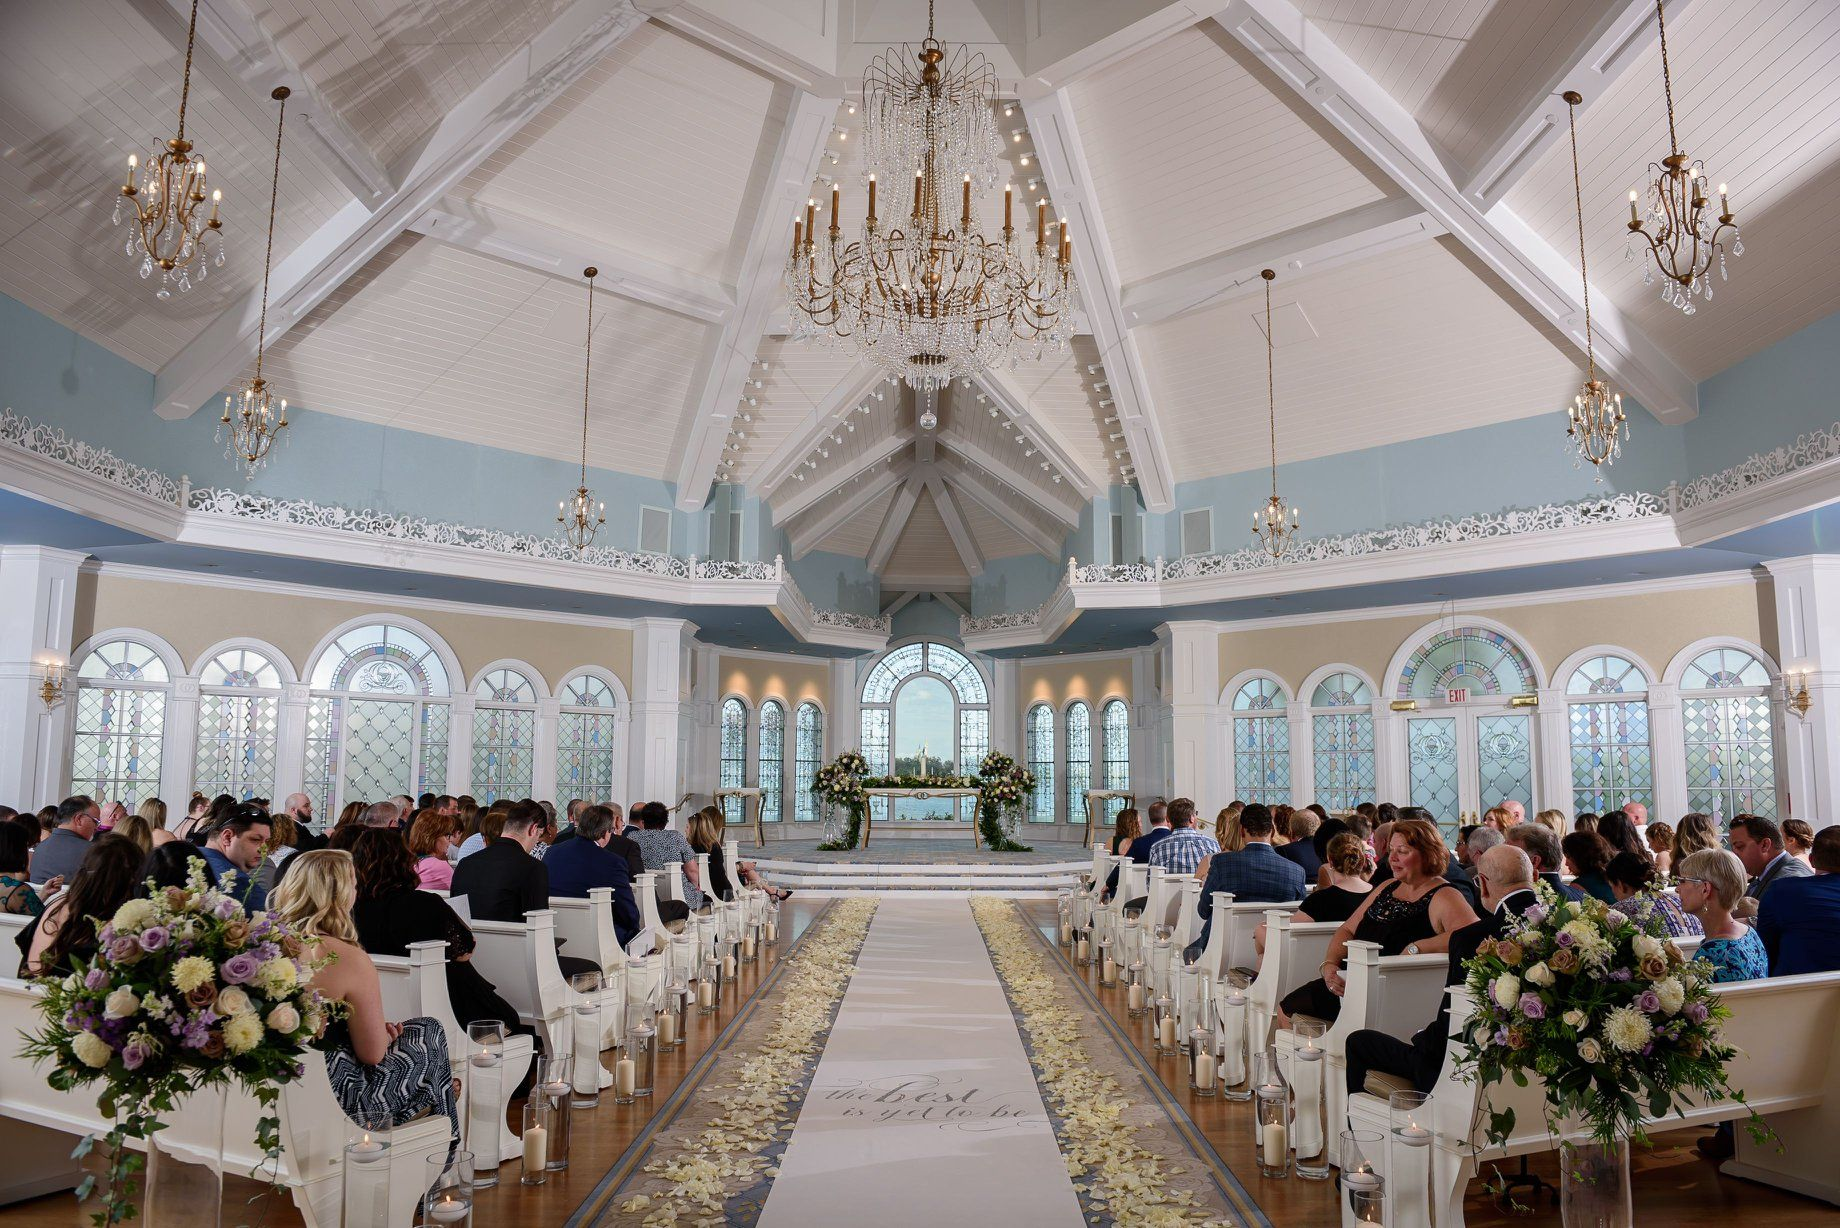 Disney's Wedding Pavilion • Fairytale Weddings Guide ...